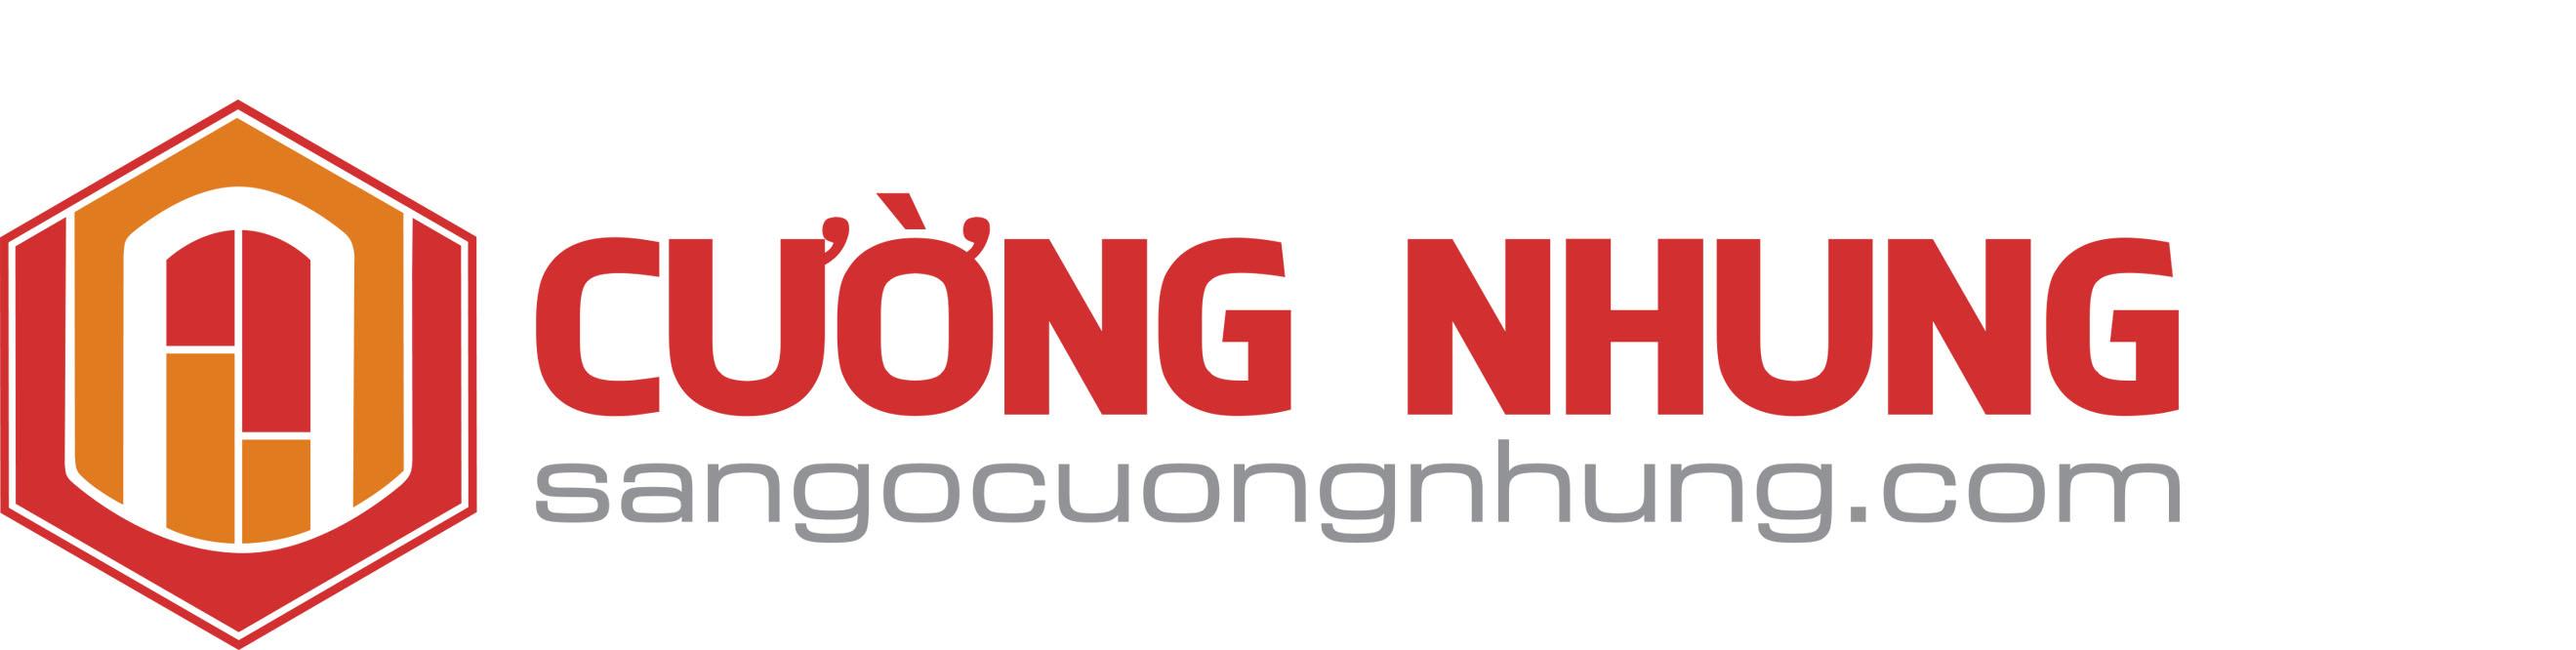 sangocuongnhung.com